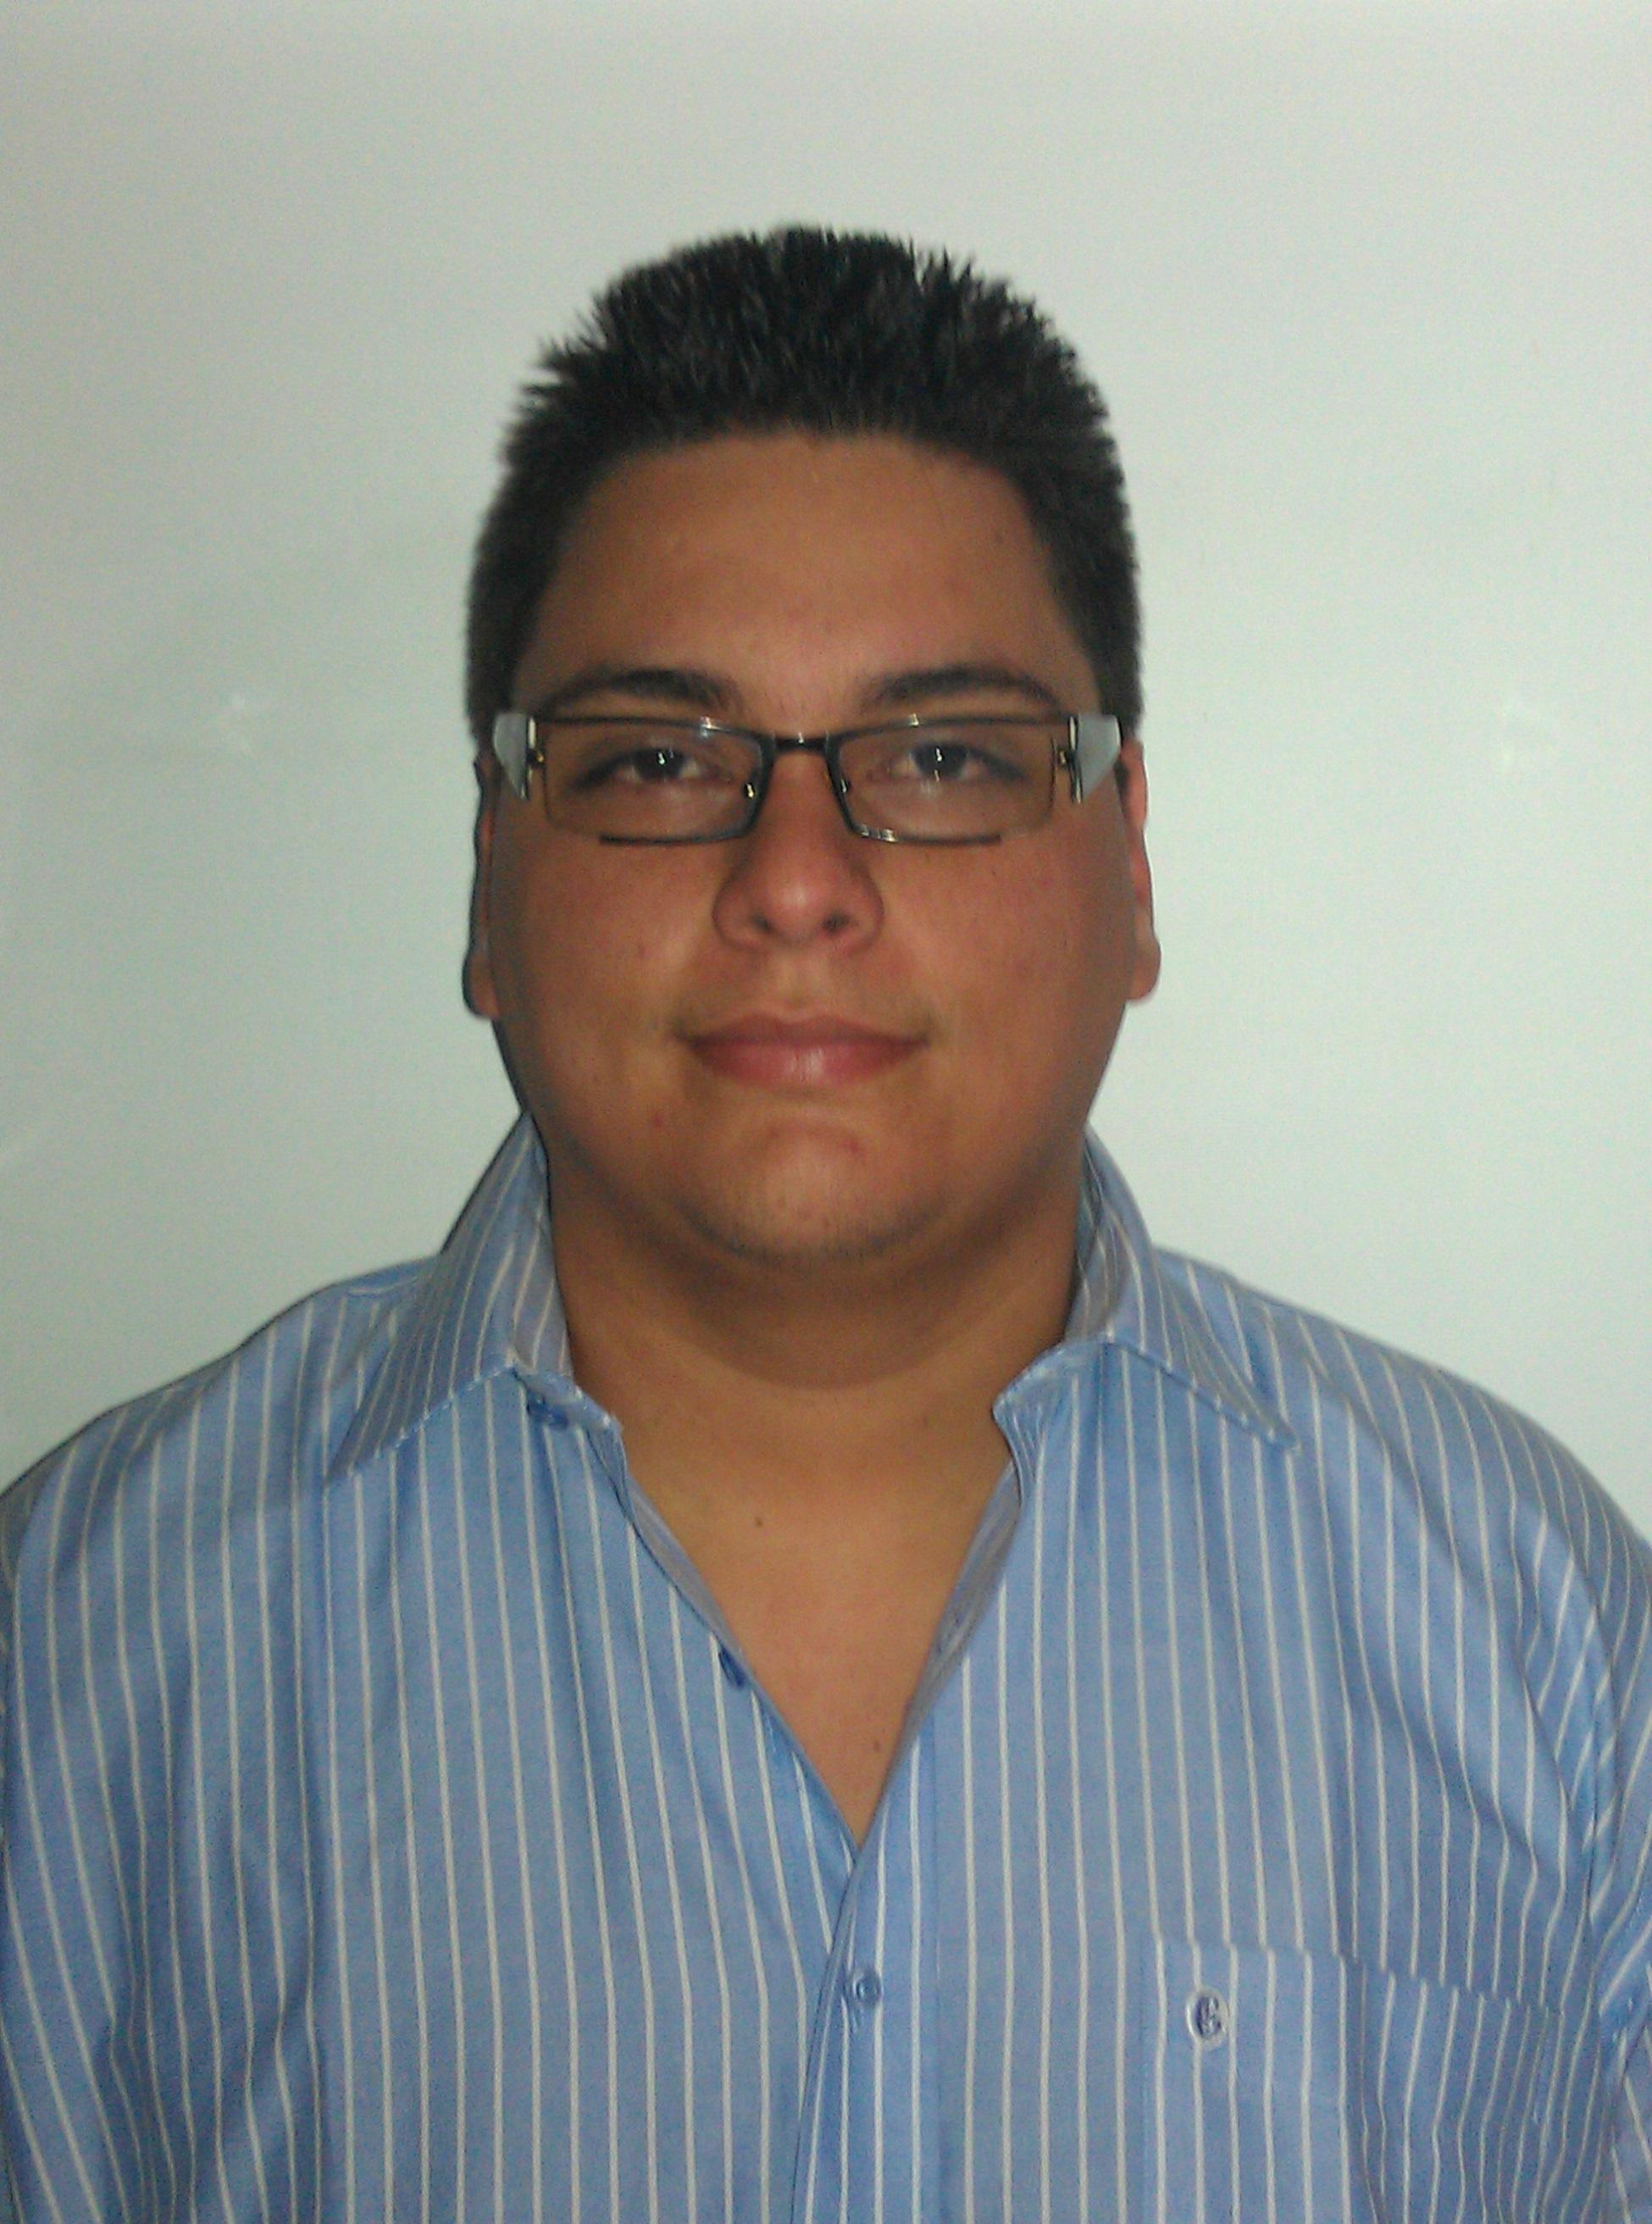 Cesar Augusto Restrepo Forero